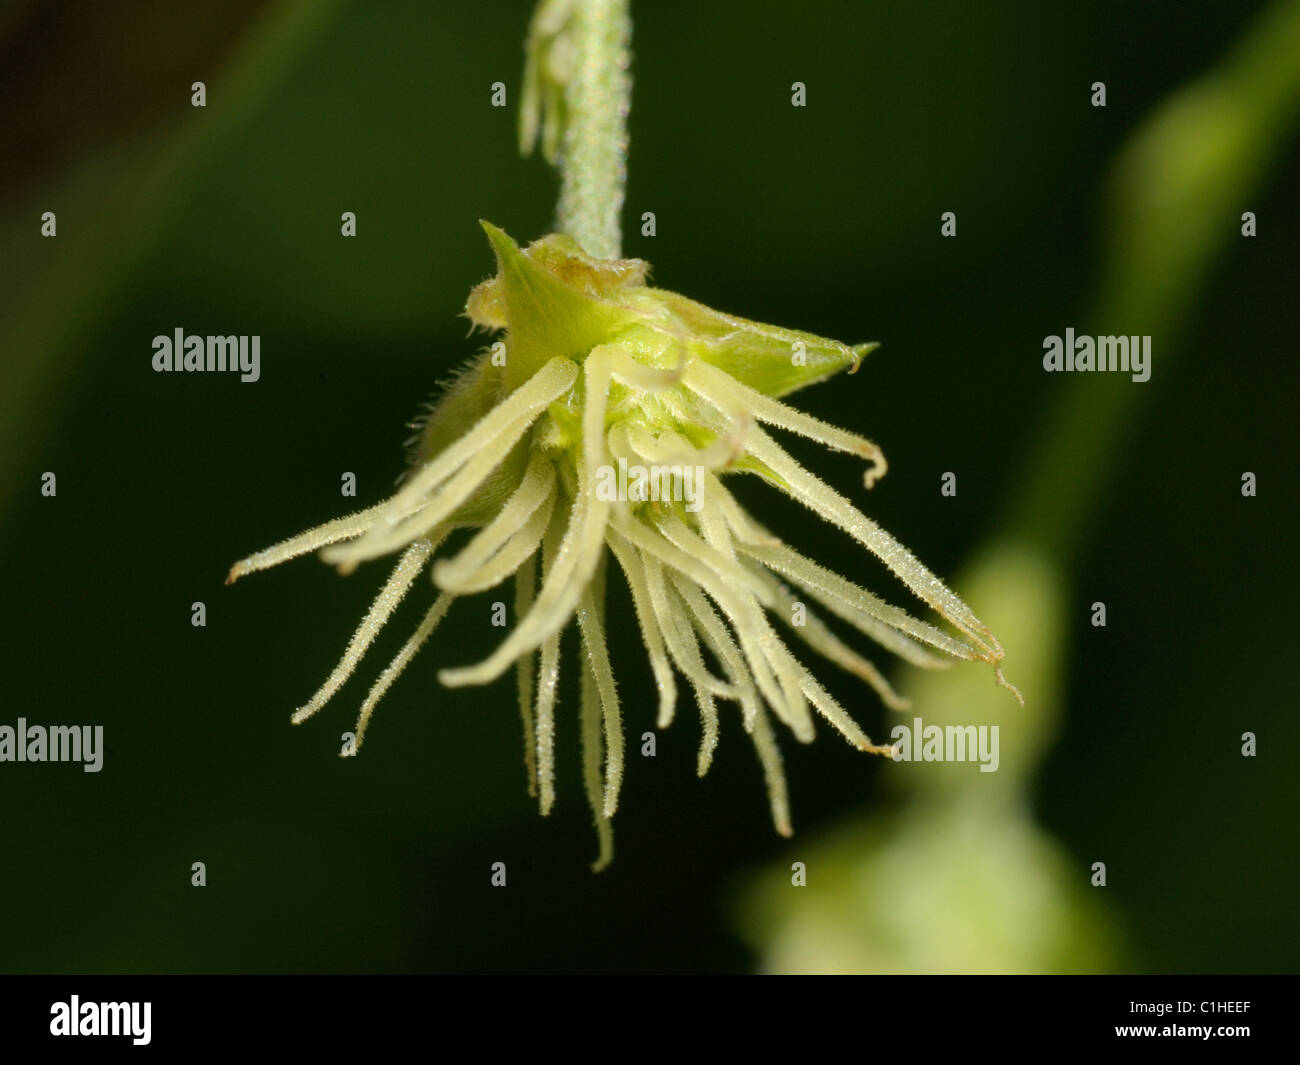 Female Hop flower, humulus lupulus - Stock Image